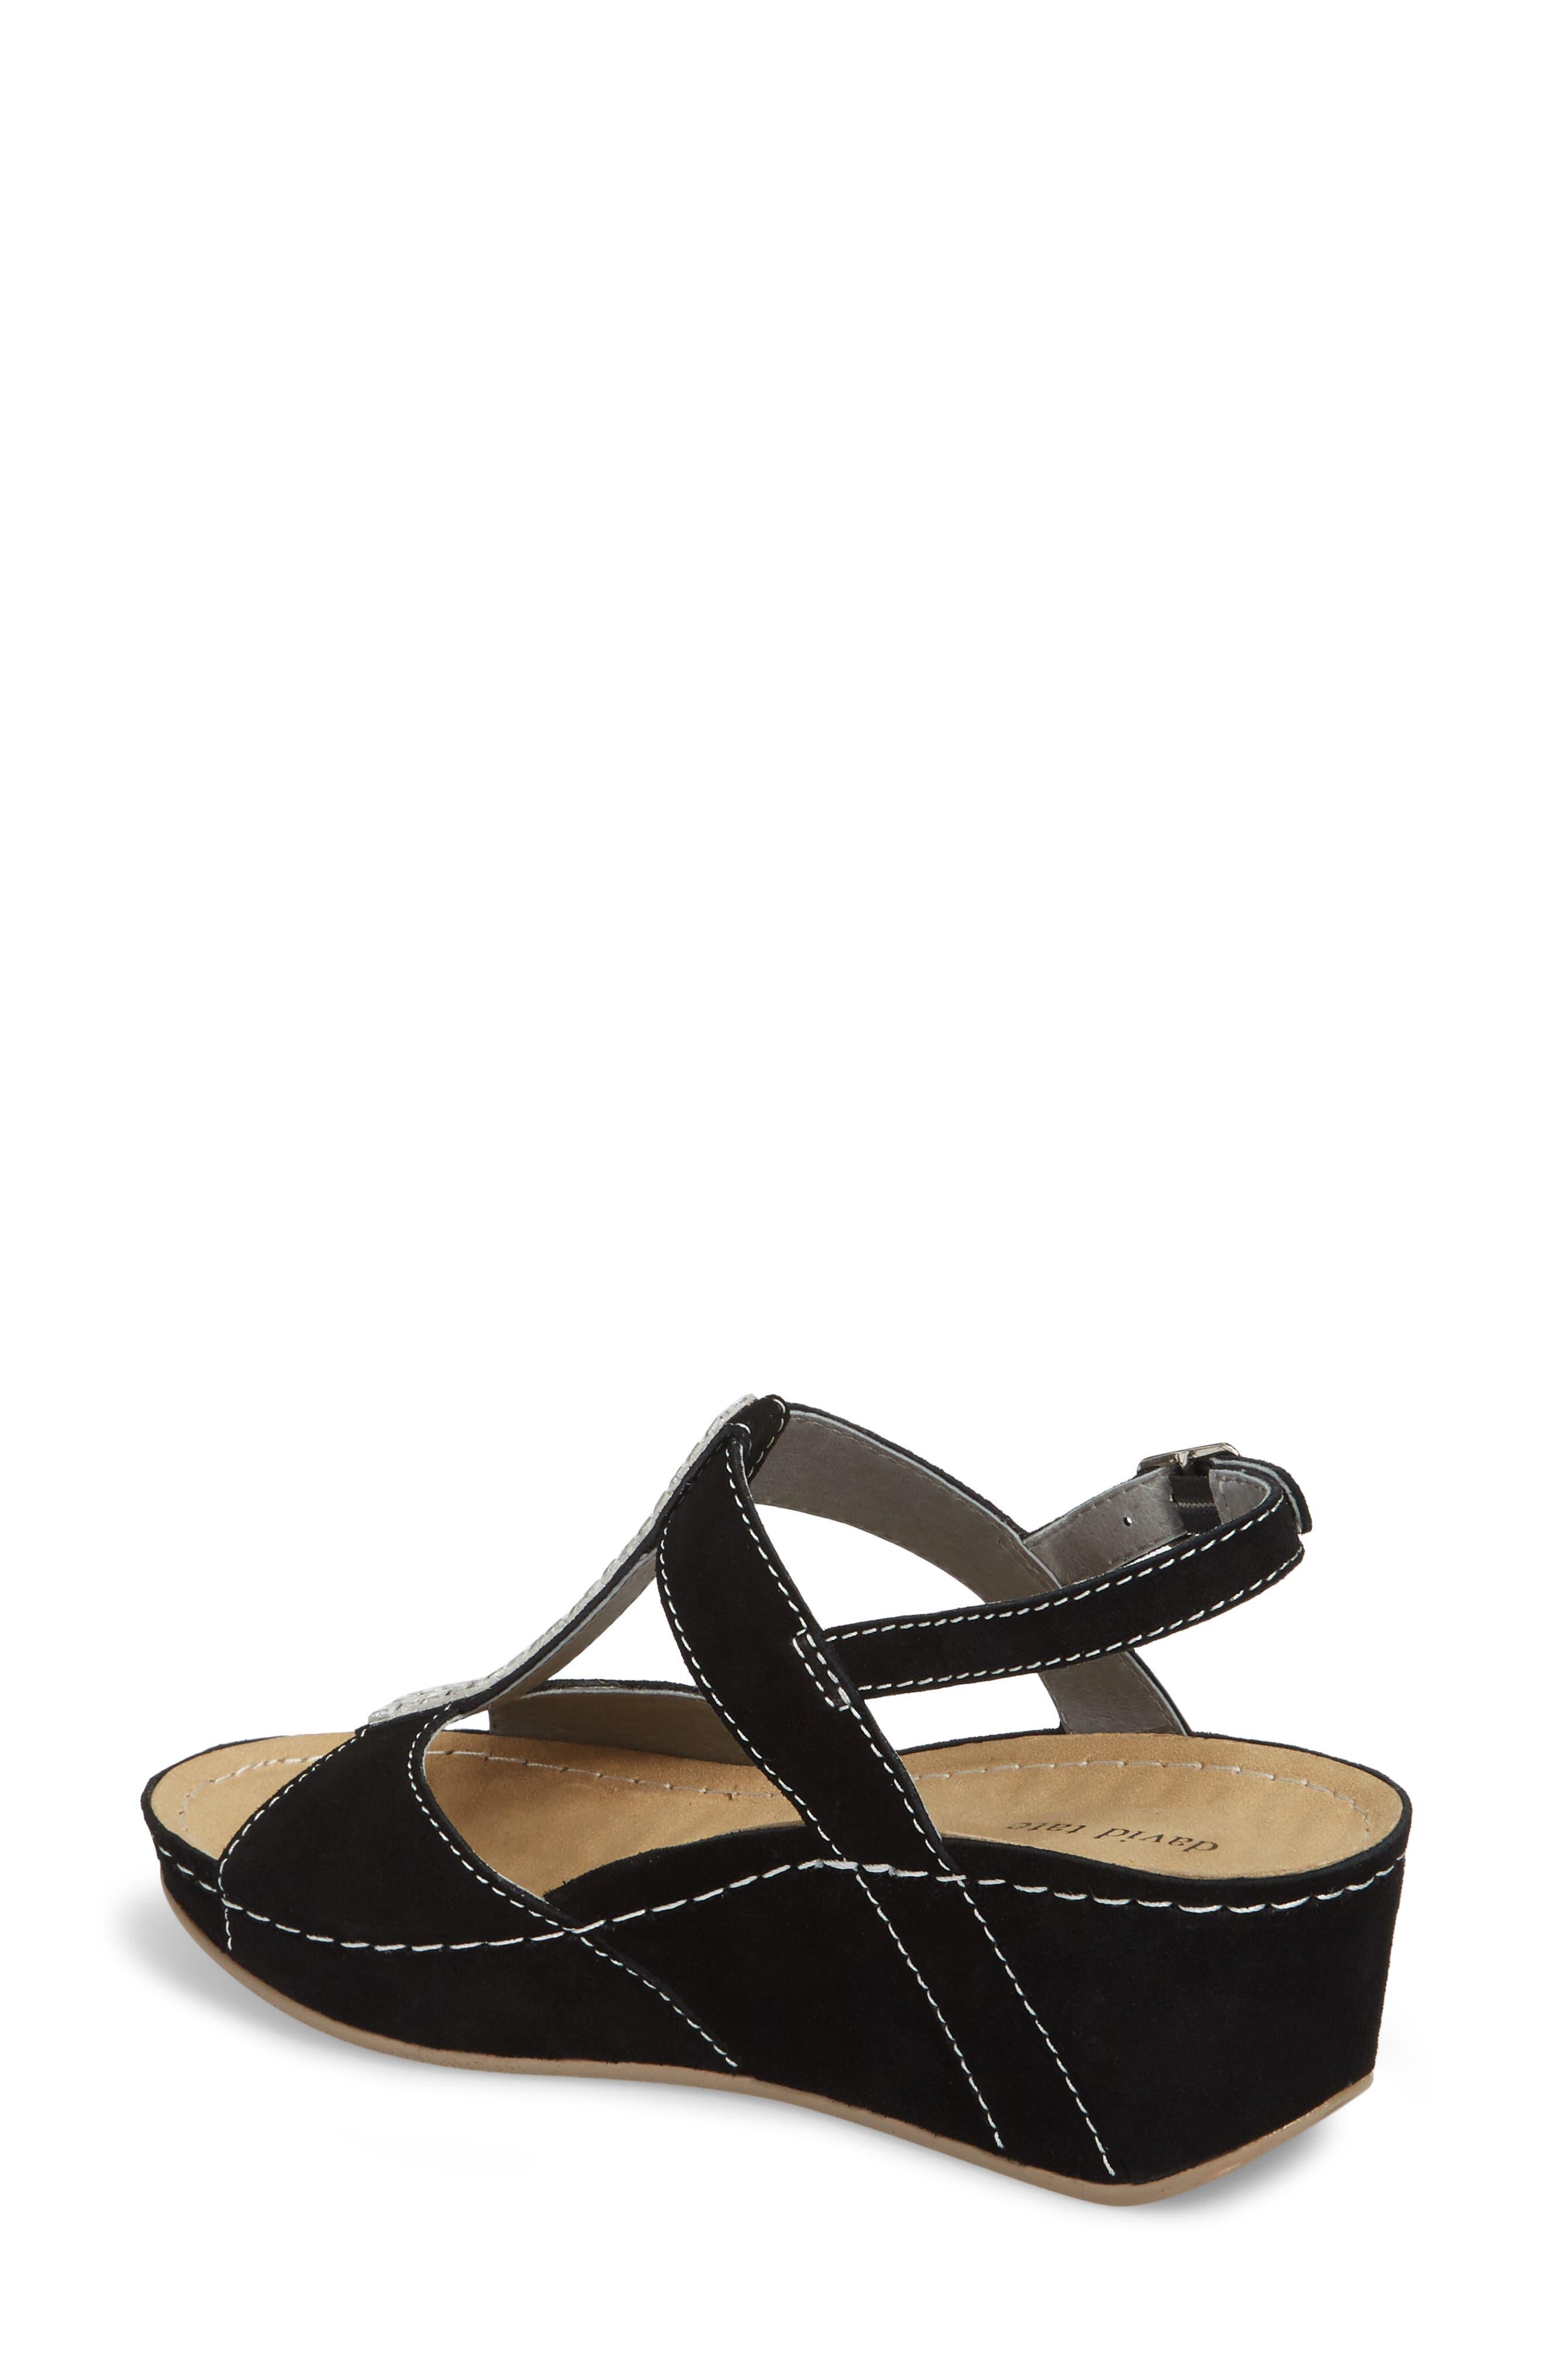 Bubbly Embellished T-Strap Wedge Sandal,                             Alternate thumbnail 2, color,                             Black Suede